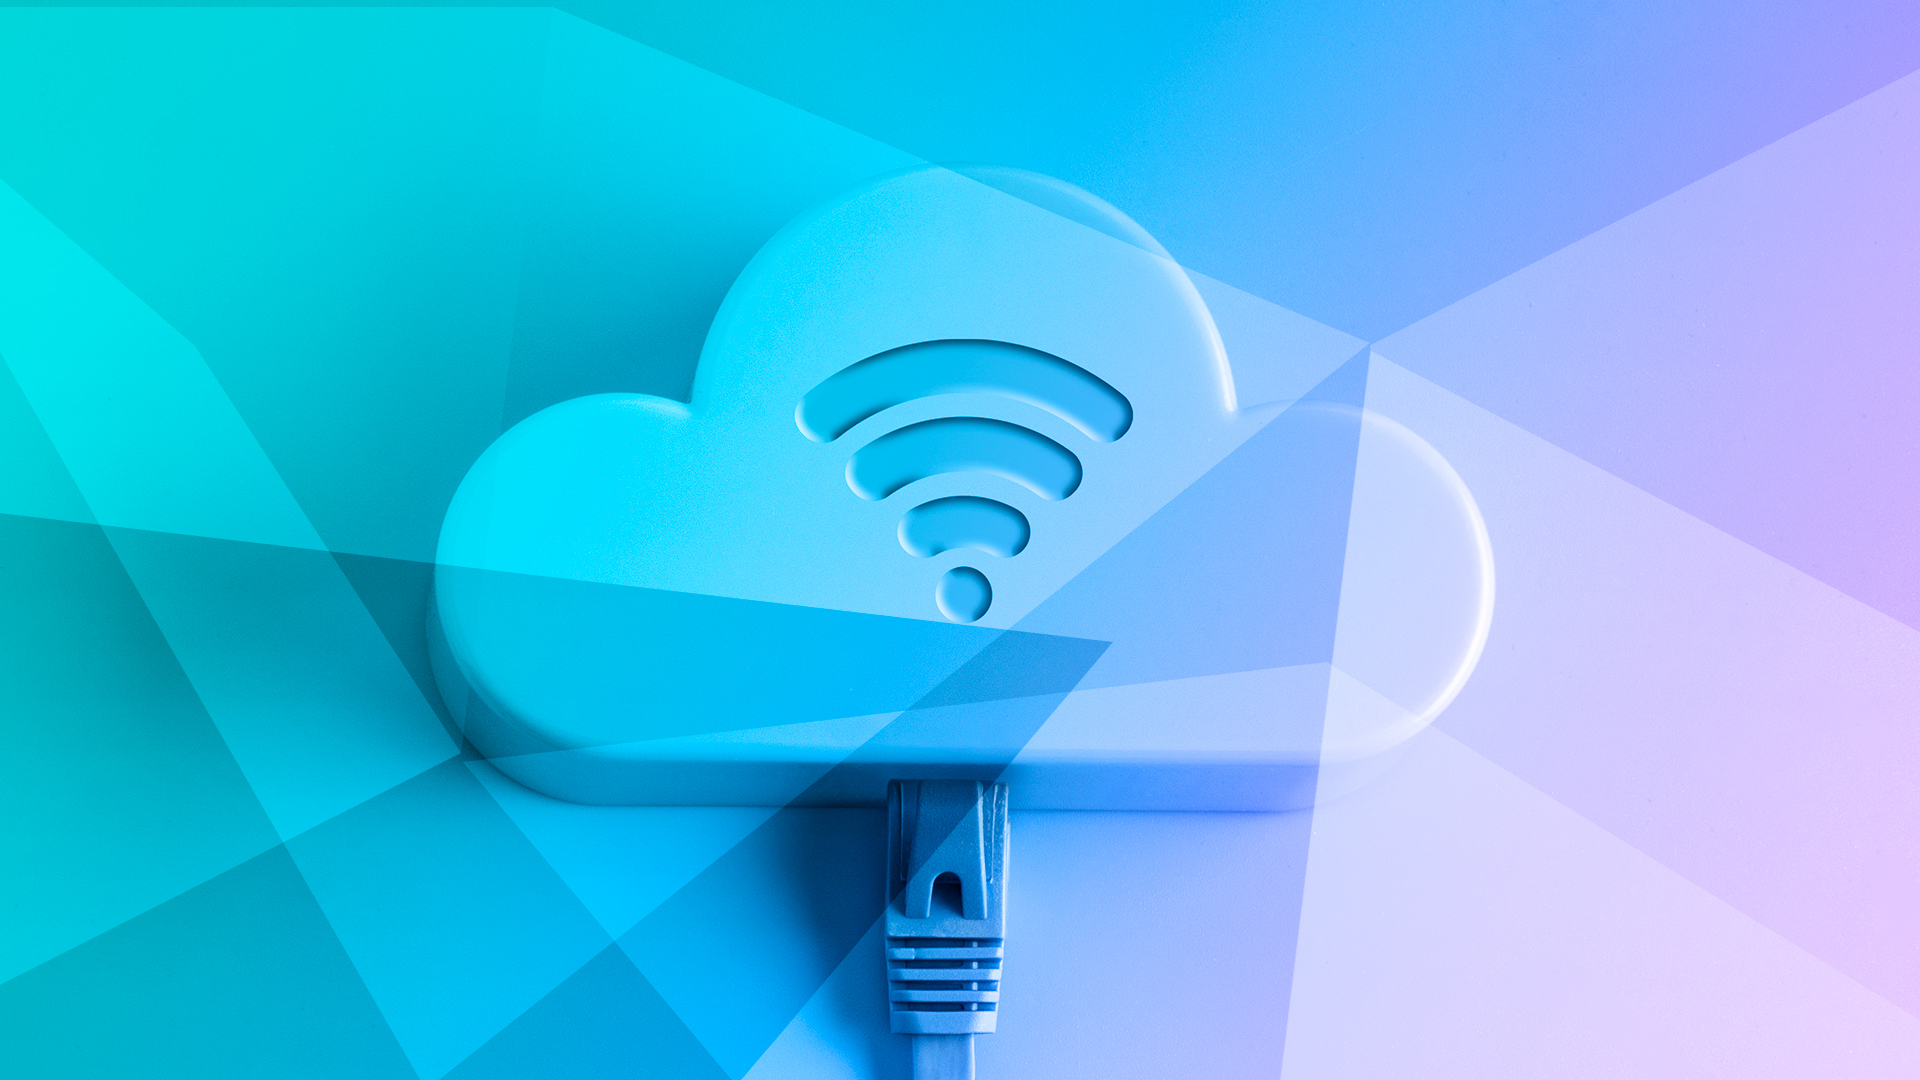 Wlan, Netzwerk, WiFi, Wireless, Hotspot, Ethernet, Wlan Hotspot, stecker, WifiSpot, Wireless LAN, Ethernet to WLan